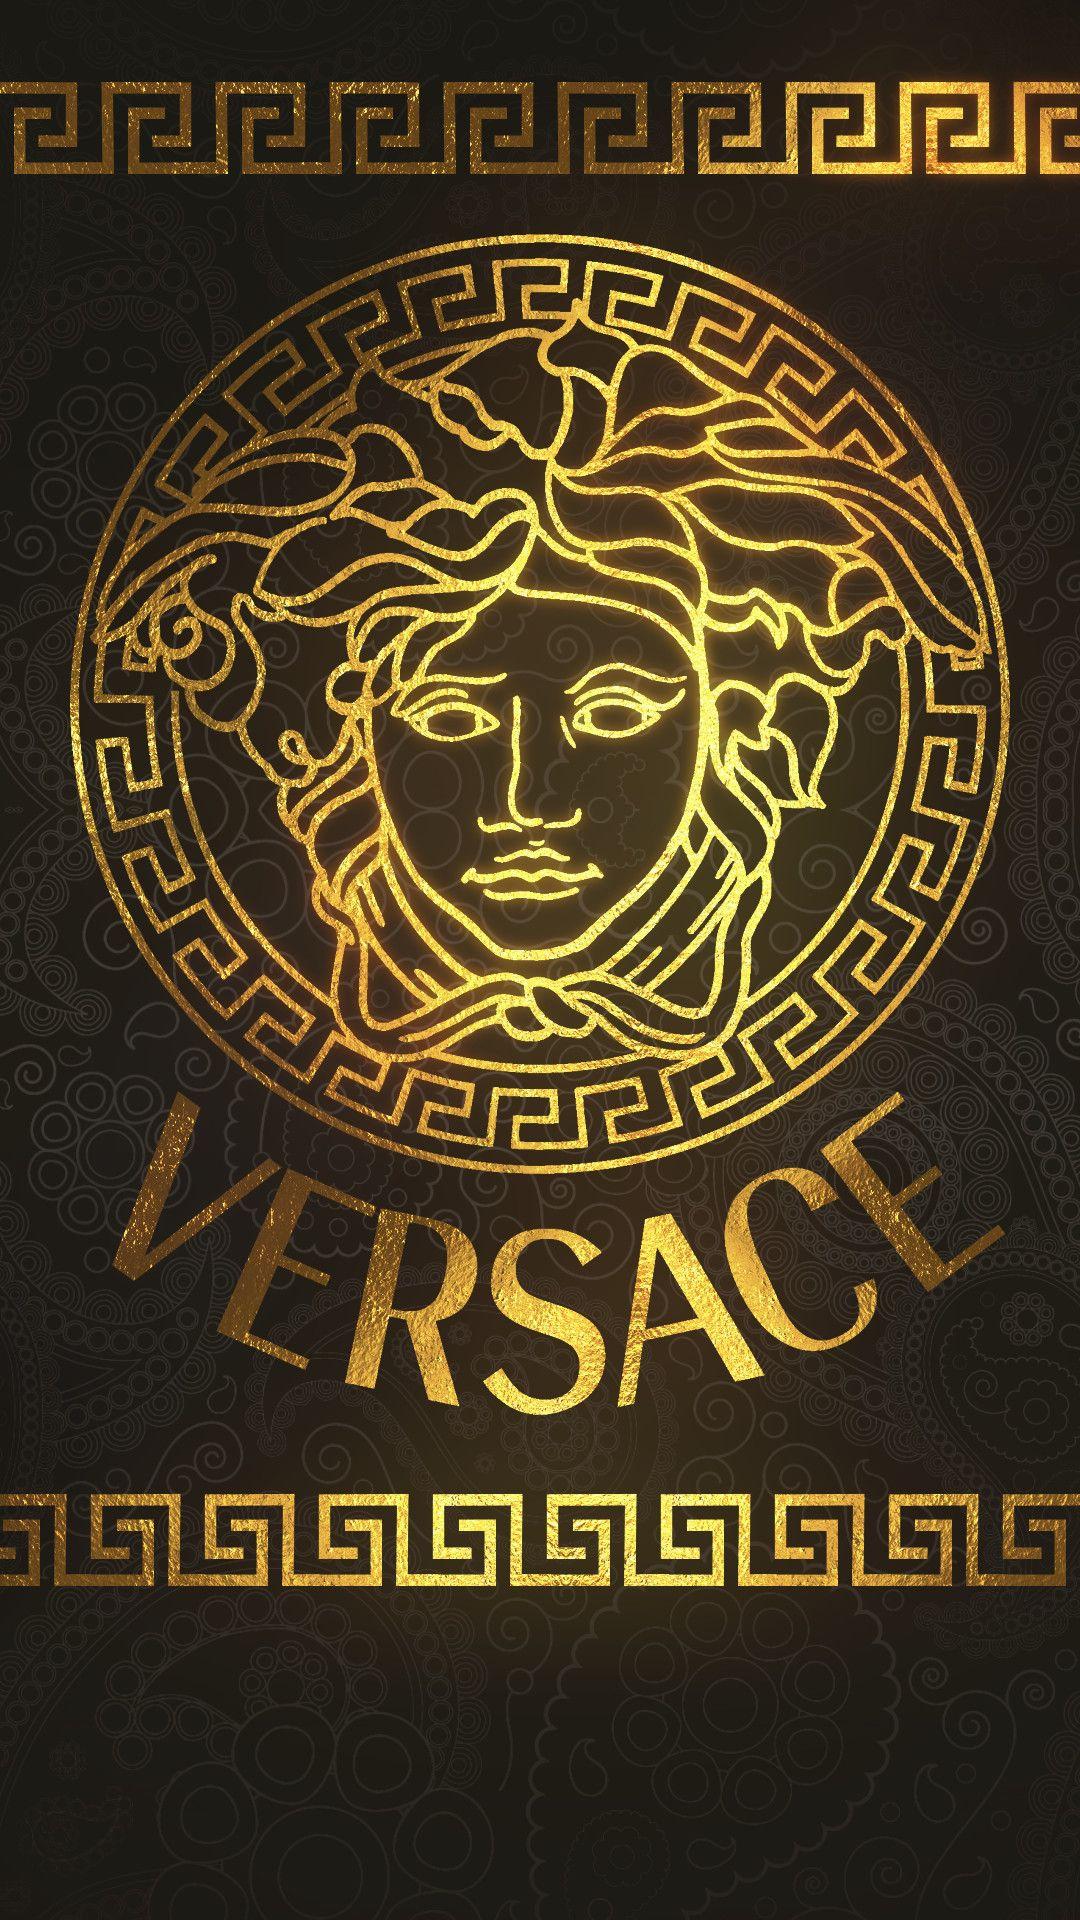 Versace에 있는 Jose Hernandez님의 핀 배경화면, 배경, 베르사체